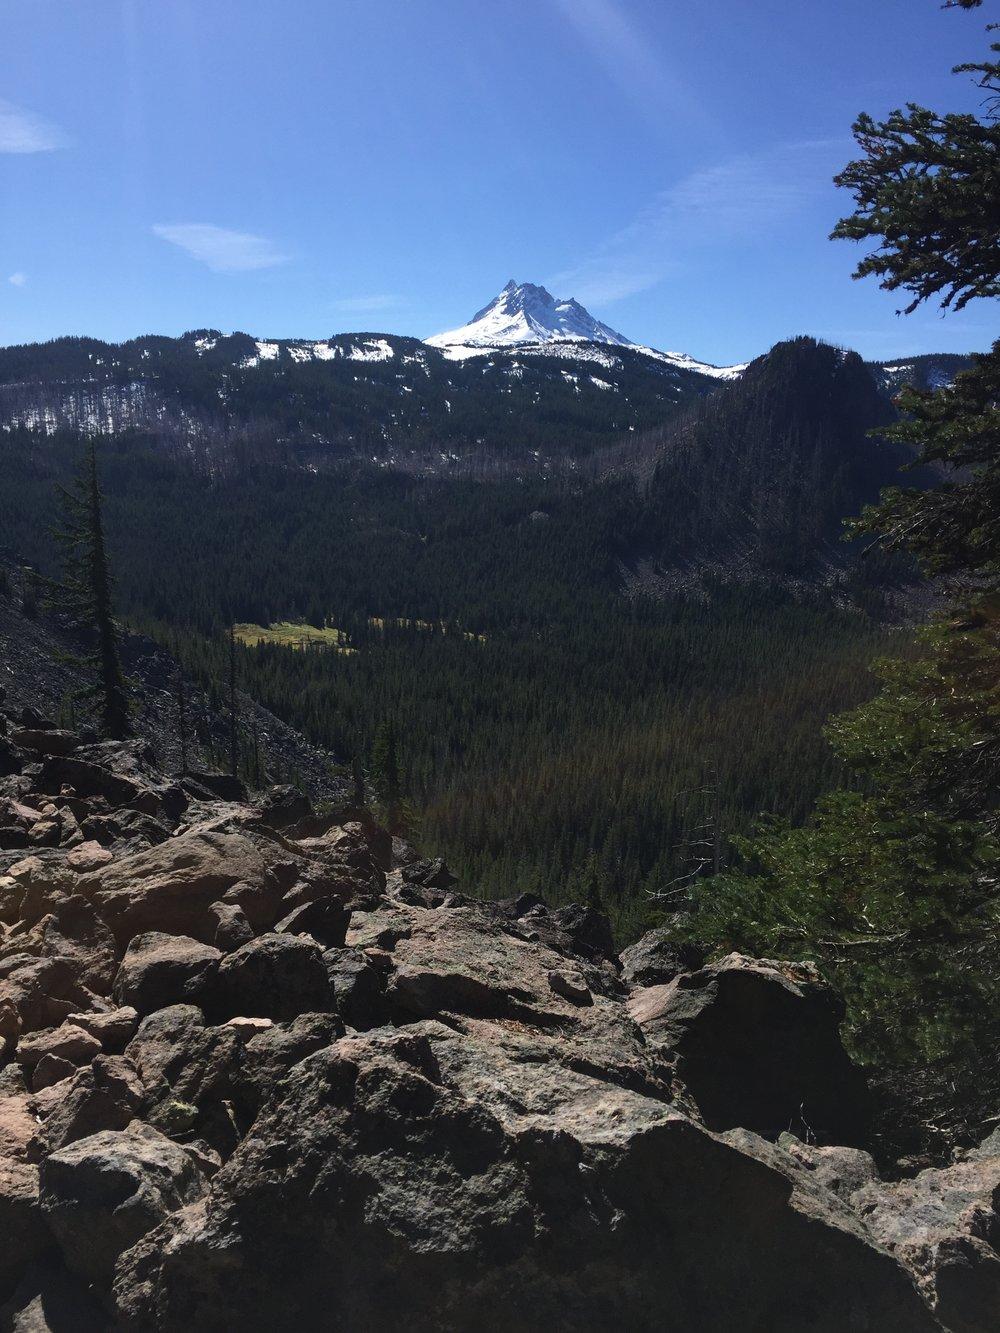 View of Mt. Jefferson